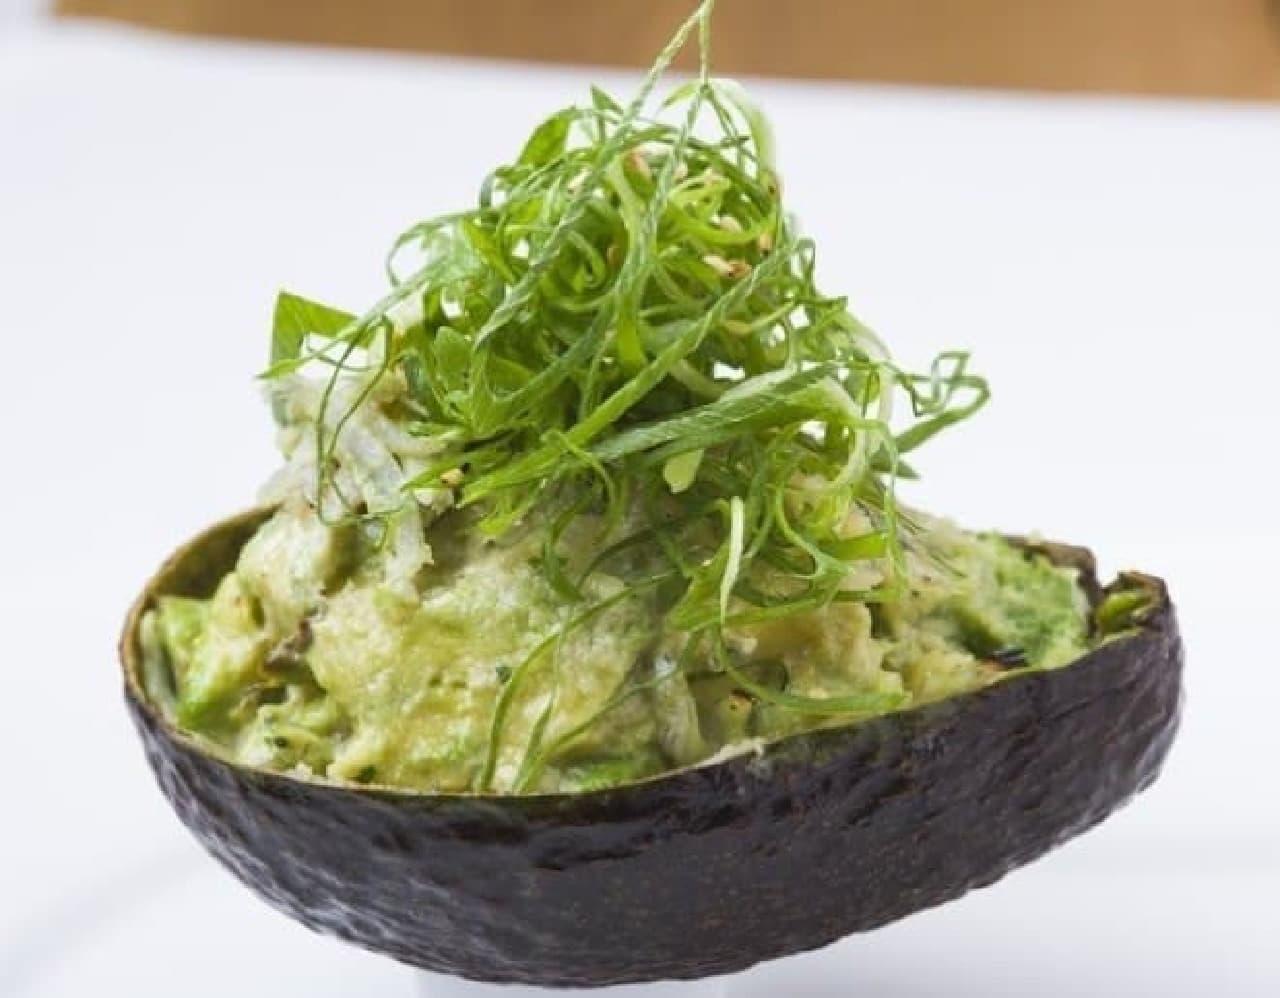 HIKARI cafe & dining渋谷店「シラスと九条ネギのガーリックバター焼き」